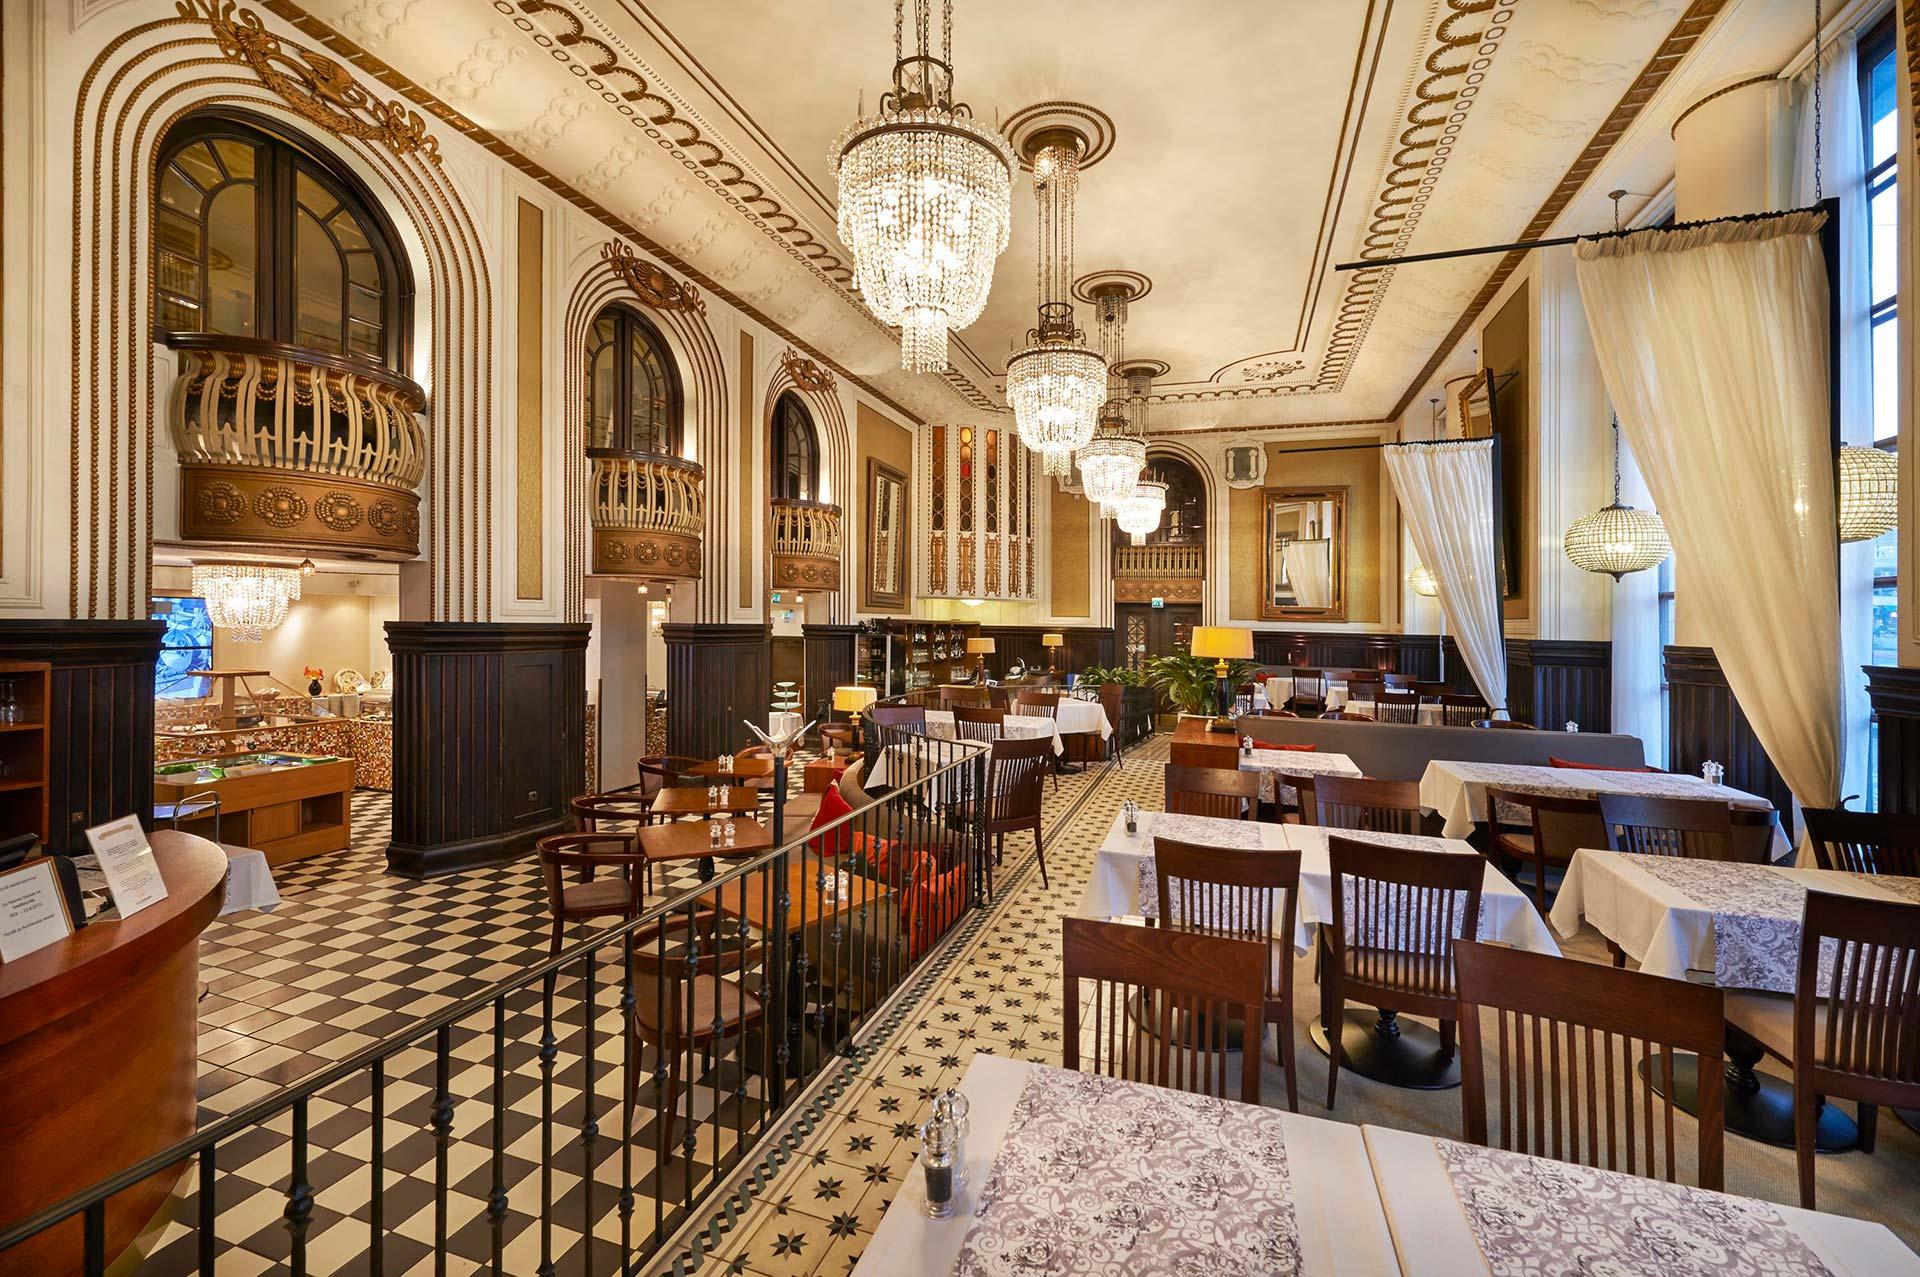 Hotelli Seurahuone Restaurant Le Havre